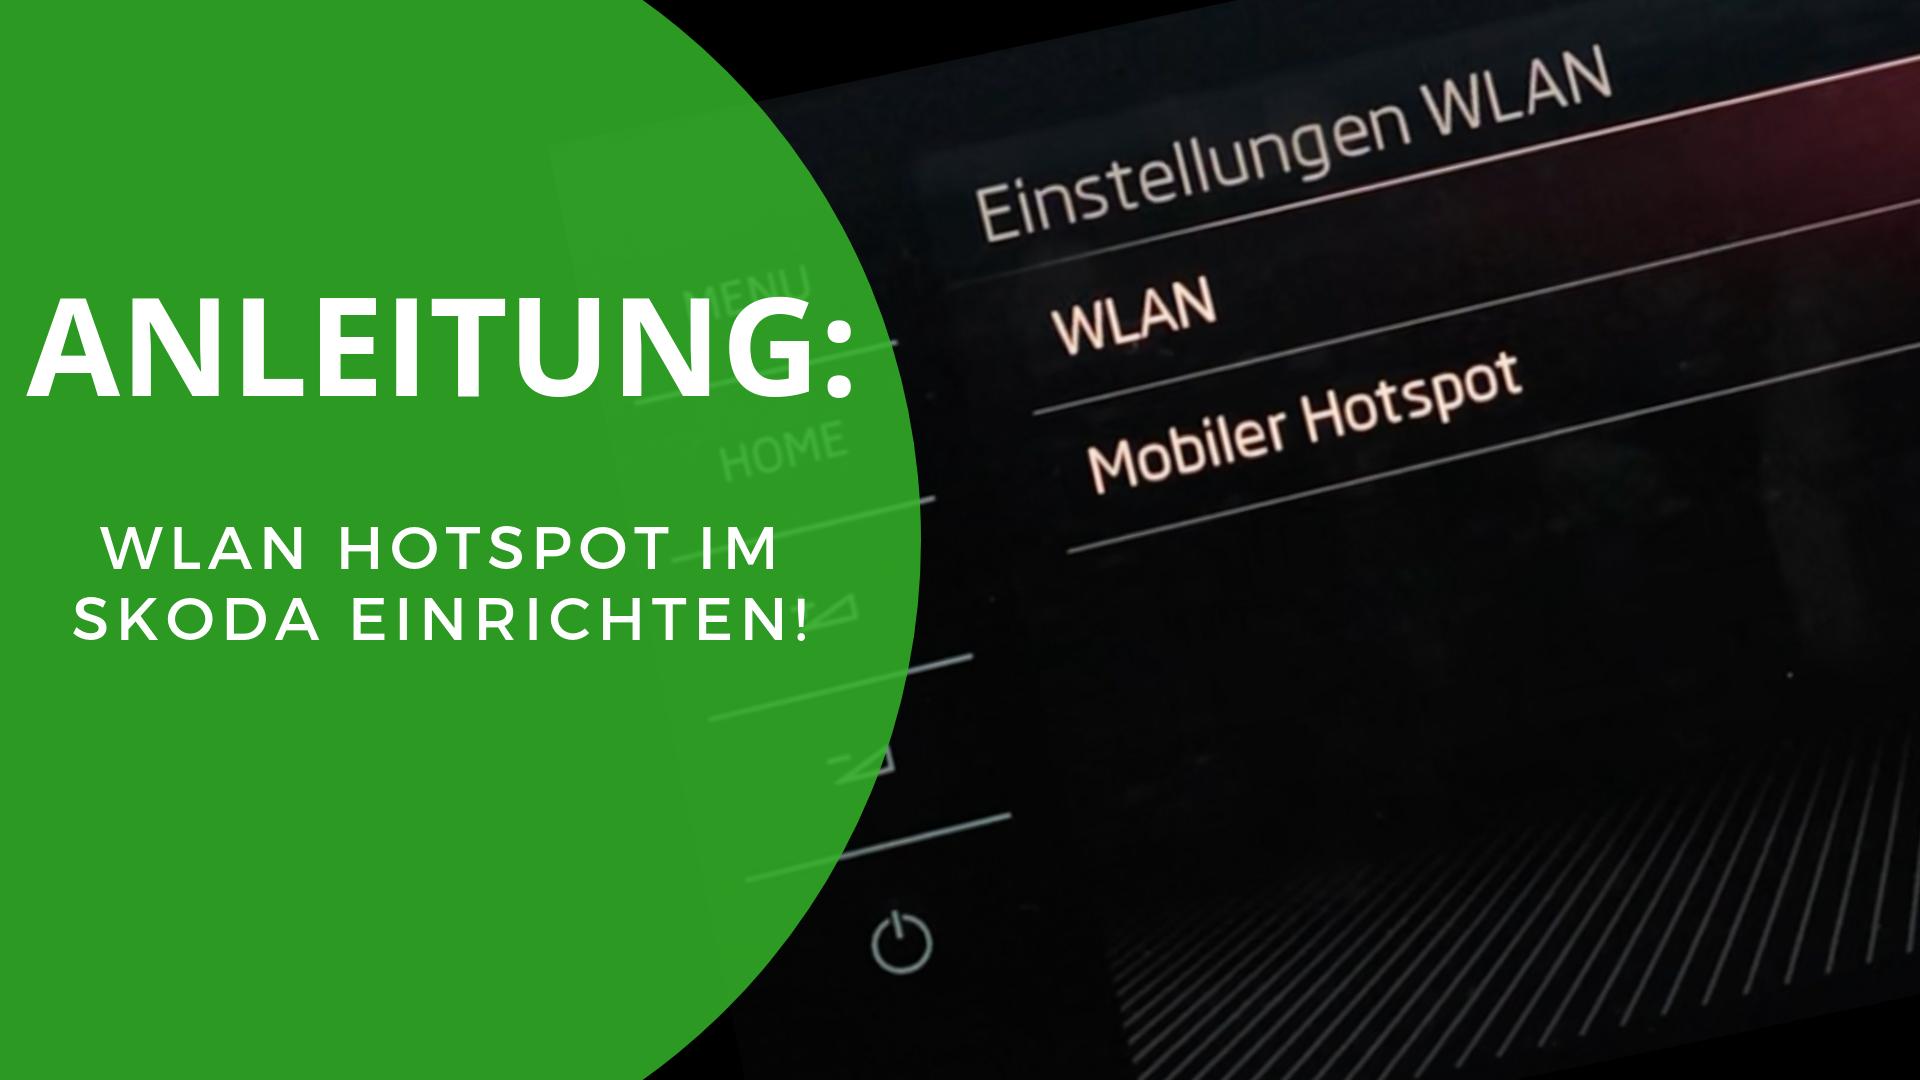 WLAN-Hotspot im Skoda: So geht´s!